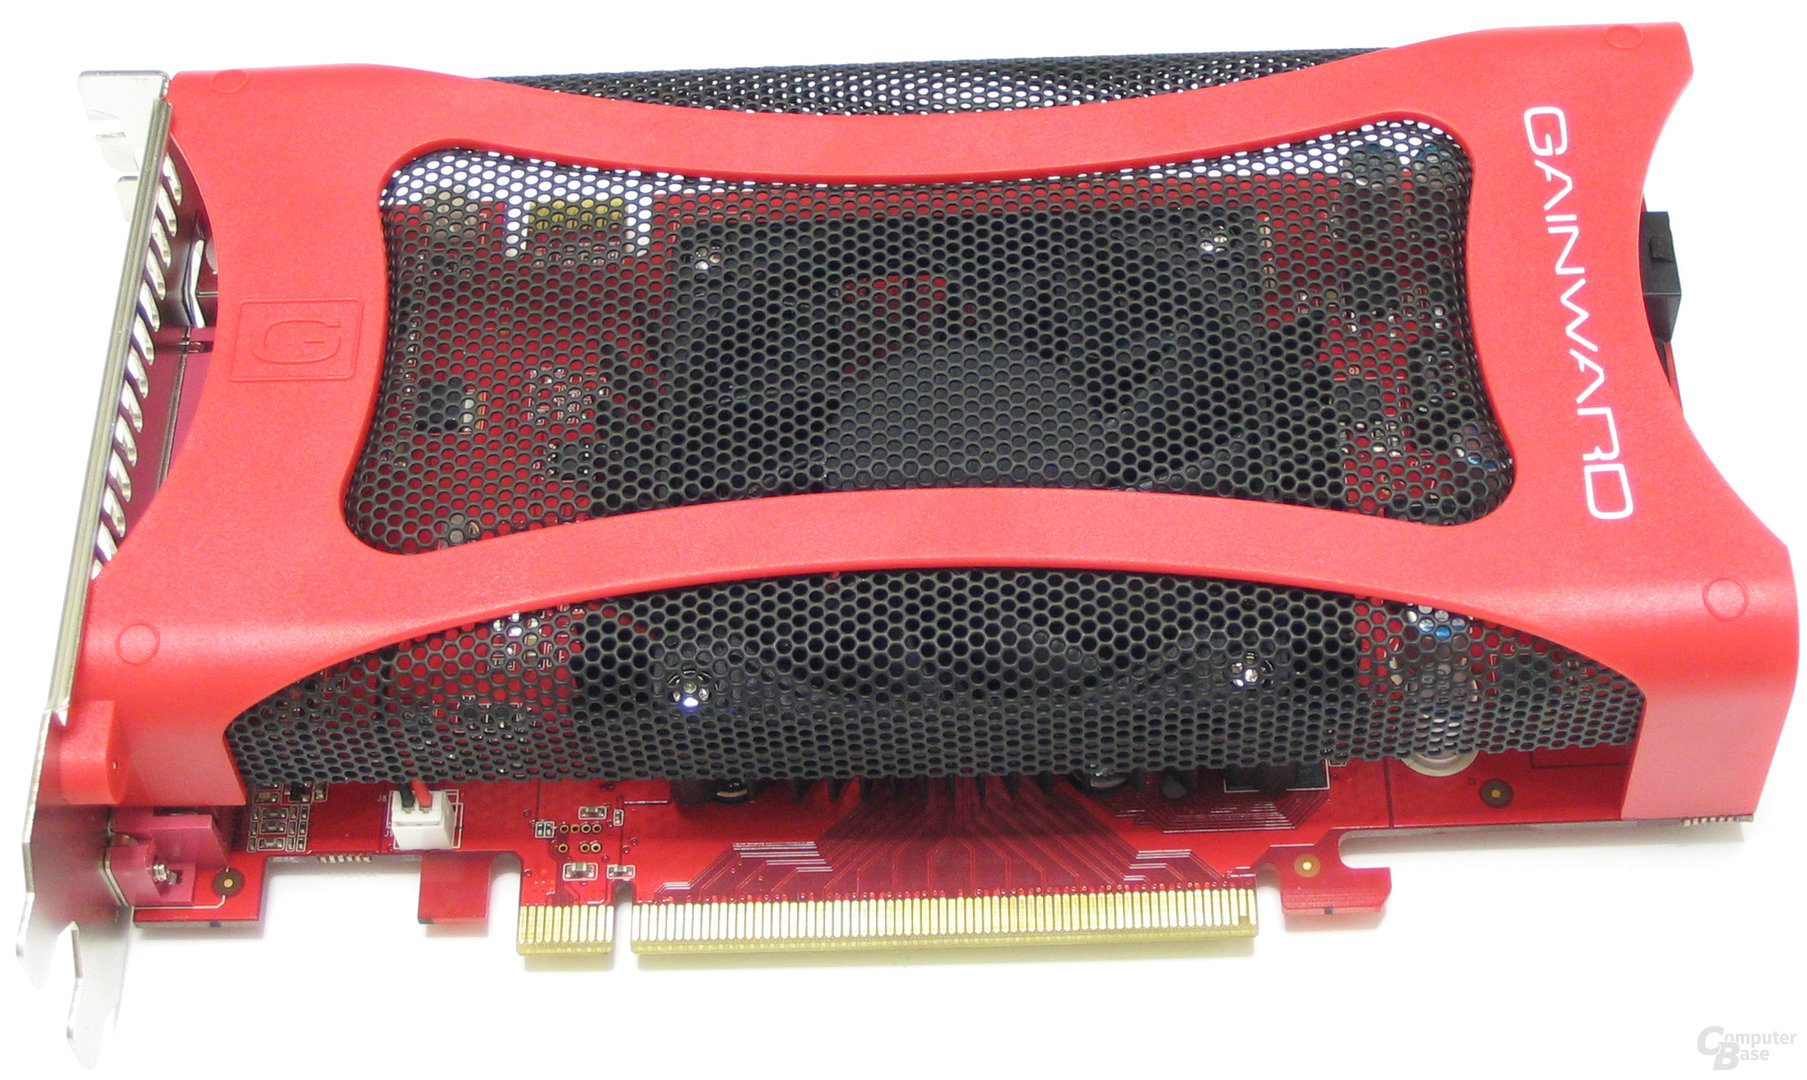 Gainward GeForce 8600 GTS 512